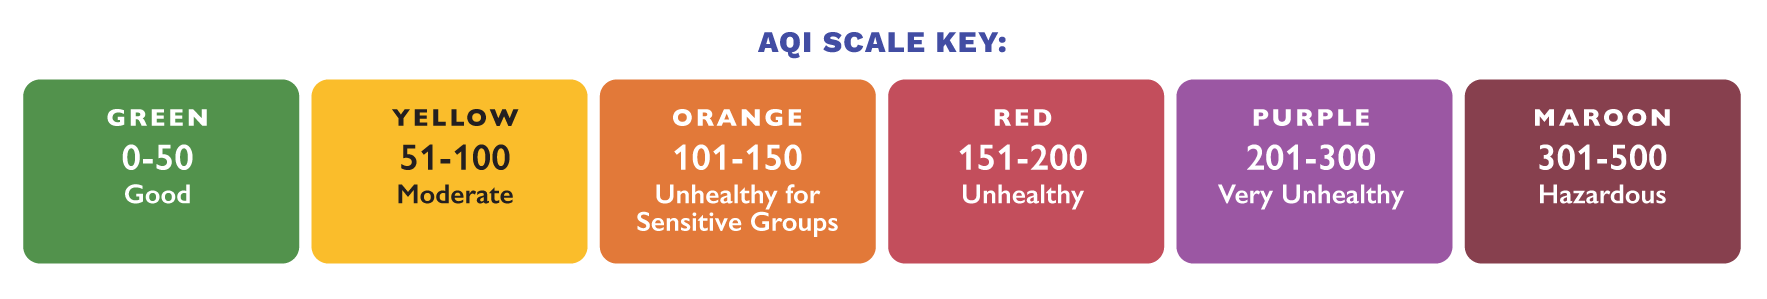 AQI Scale Image